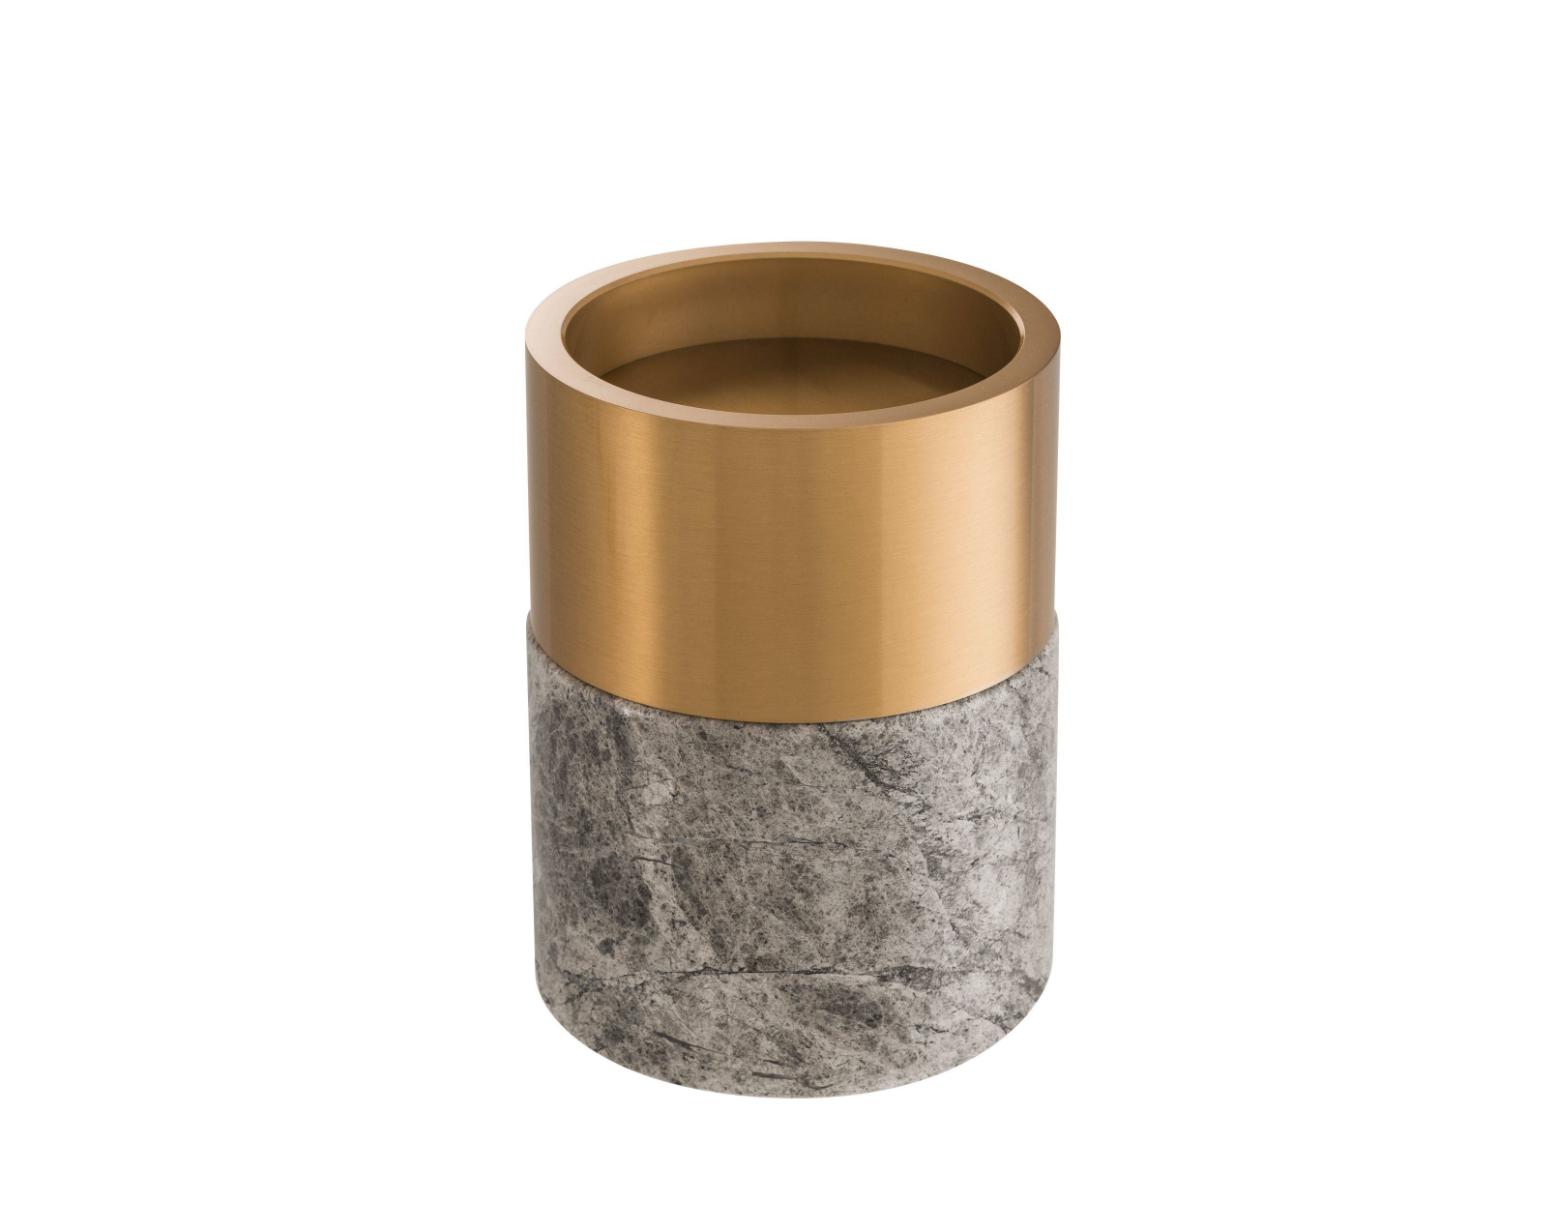 Eichholtz Candle holder Sierra Set - Set of 3